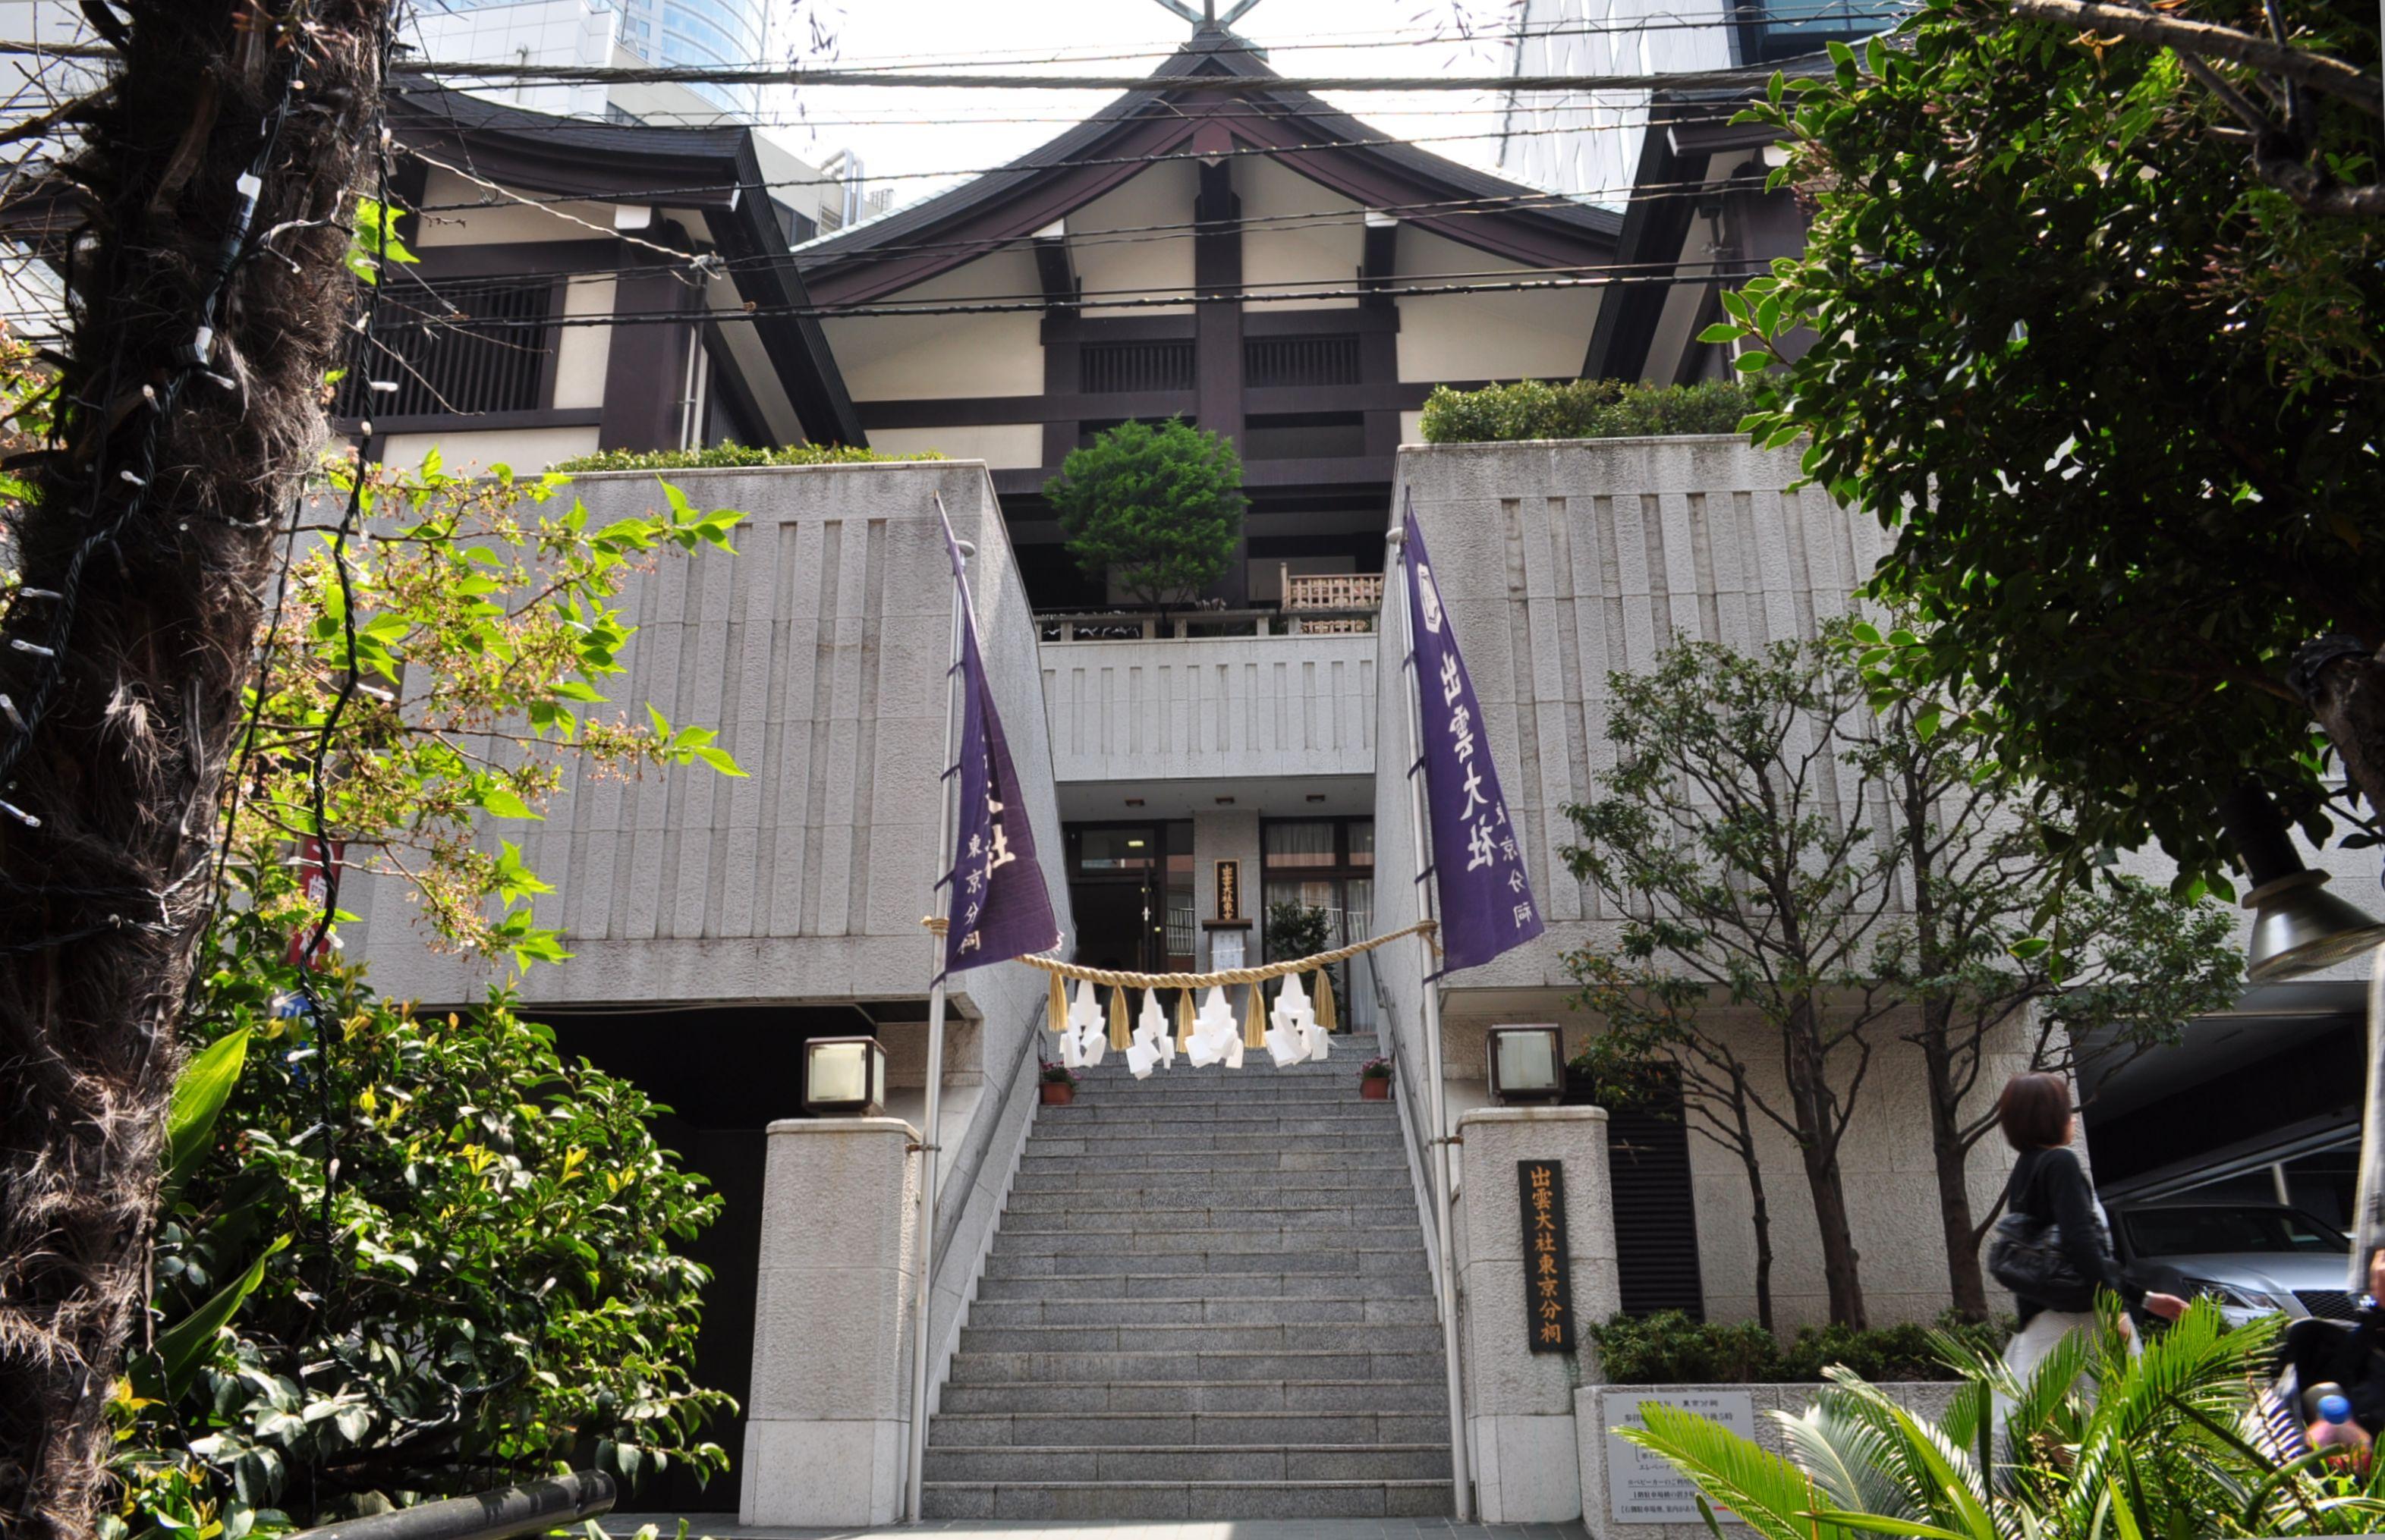 https://upload.wikimedia.org/wikipedia/commons/9/98/Izumo-Taisha-Tokyo-bunshi-1.jpg